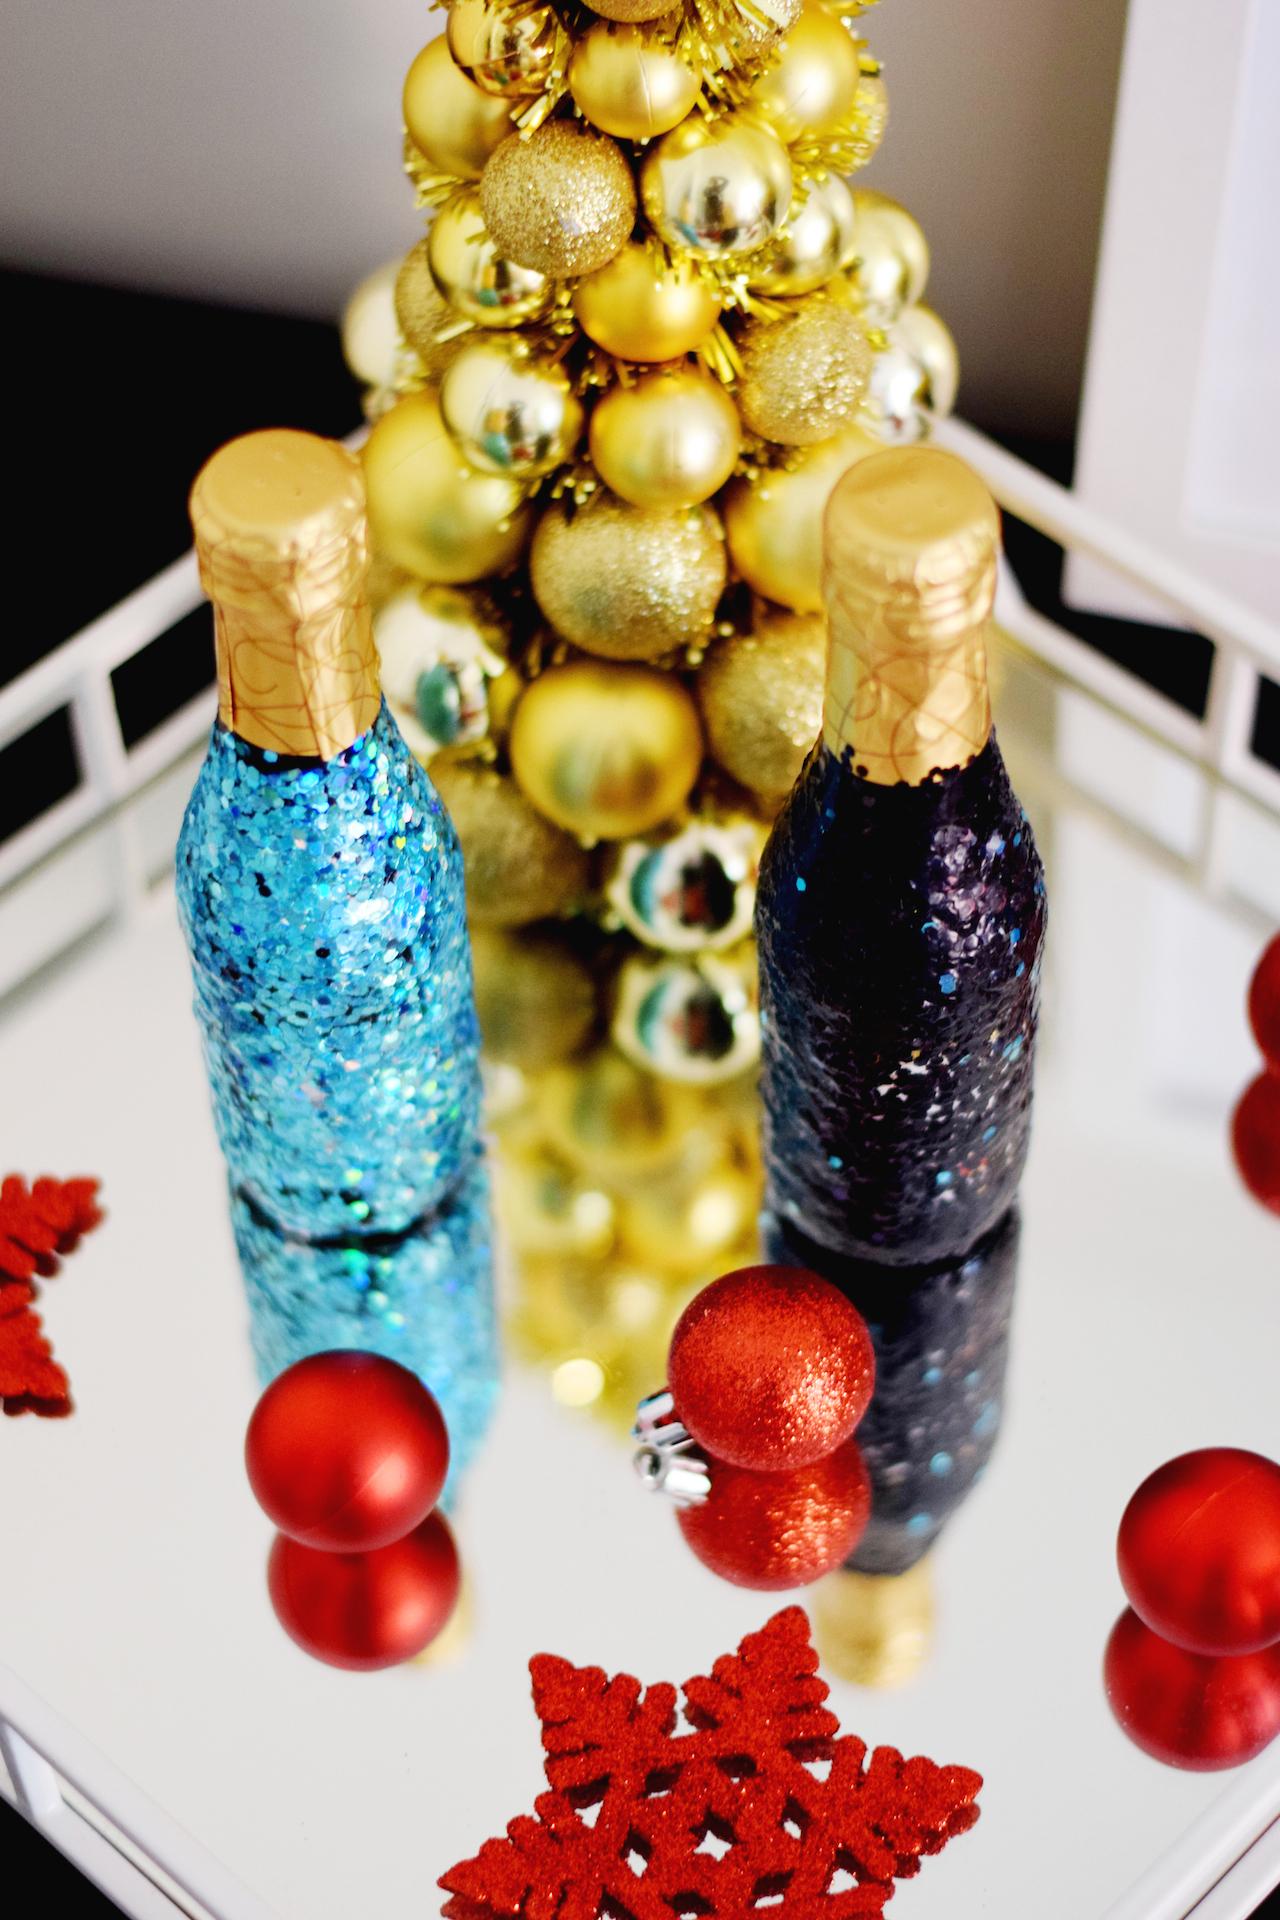 Новогодний декор бутылки шампанского глиттером